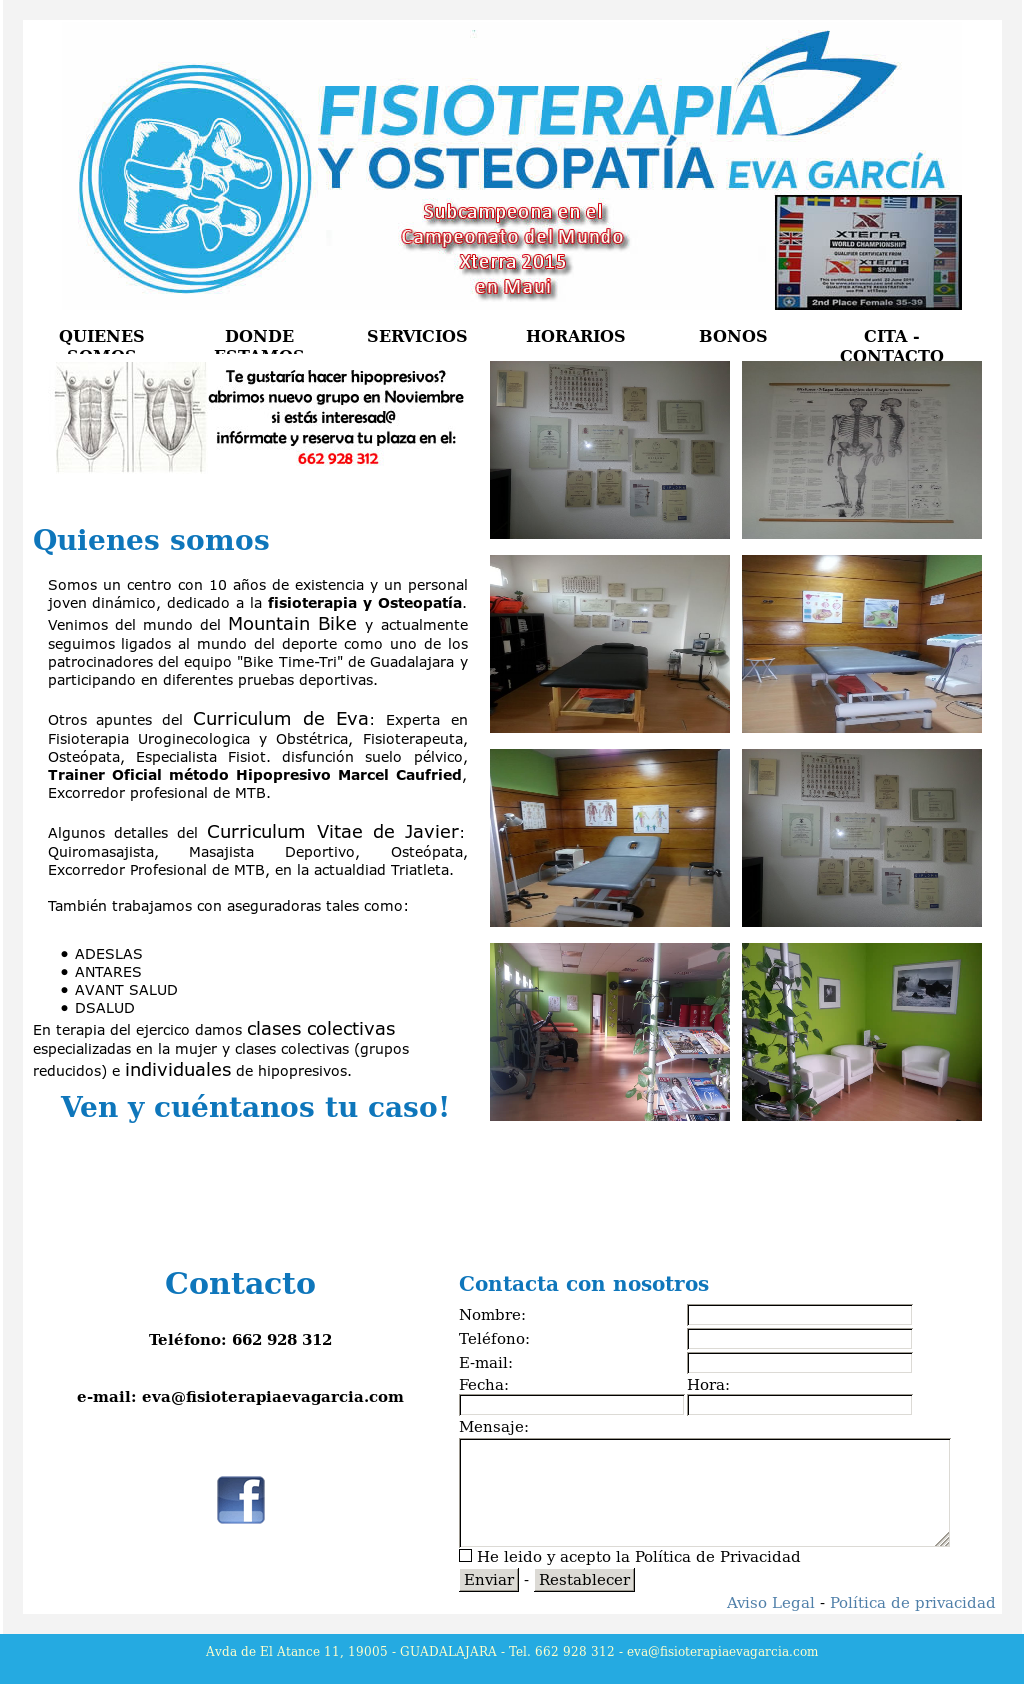 Fisioterapia Y Osteopatia Eva Garcia Competitors Revenue